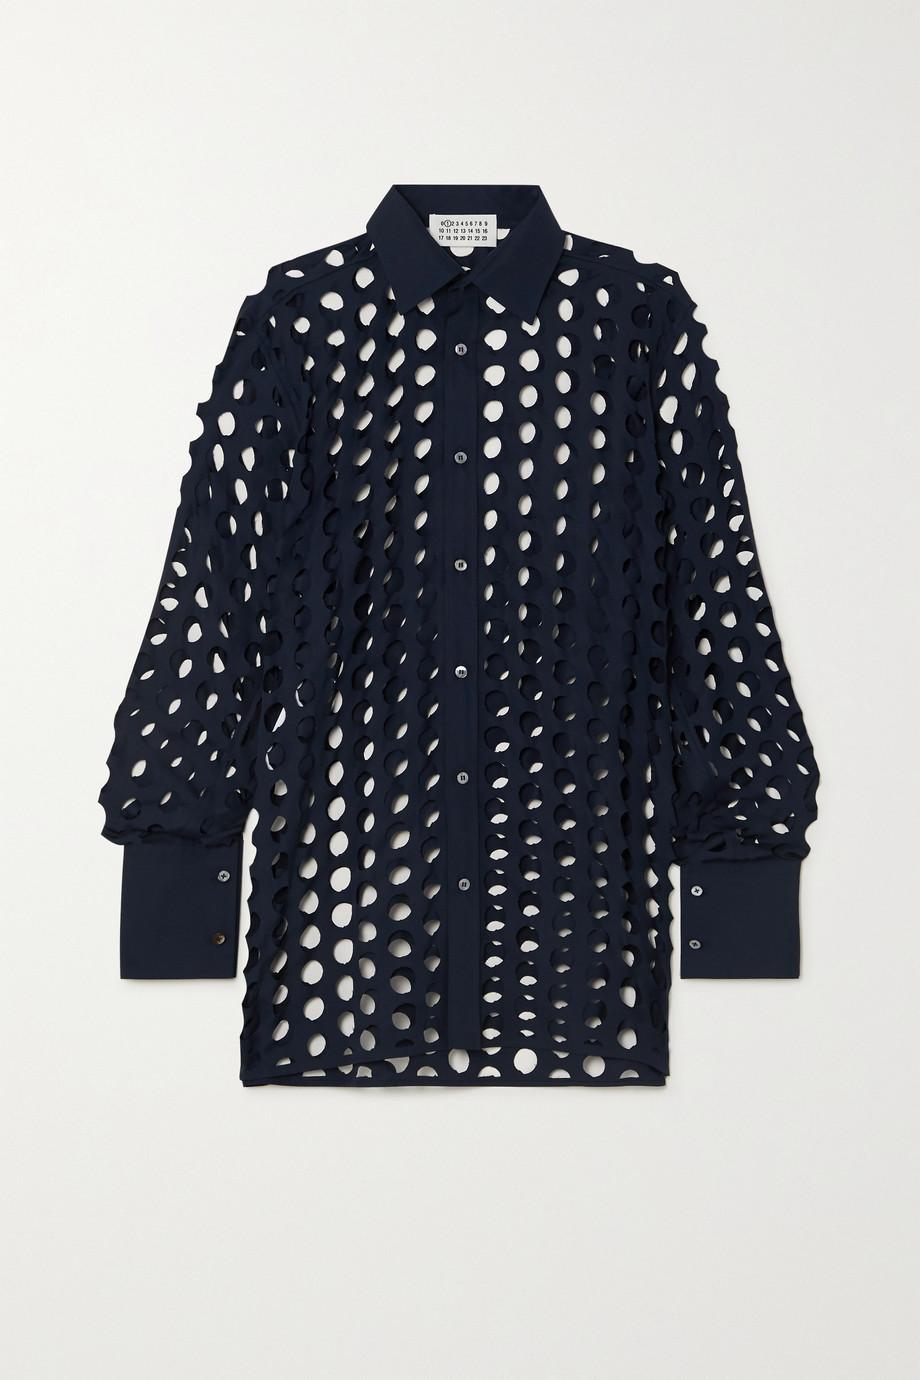 Maison Margiela Distressed cotton-poplin shirt